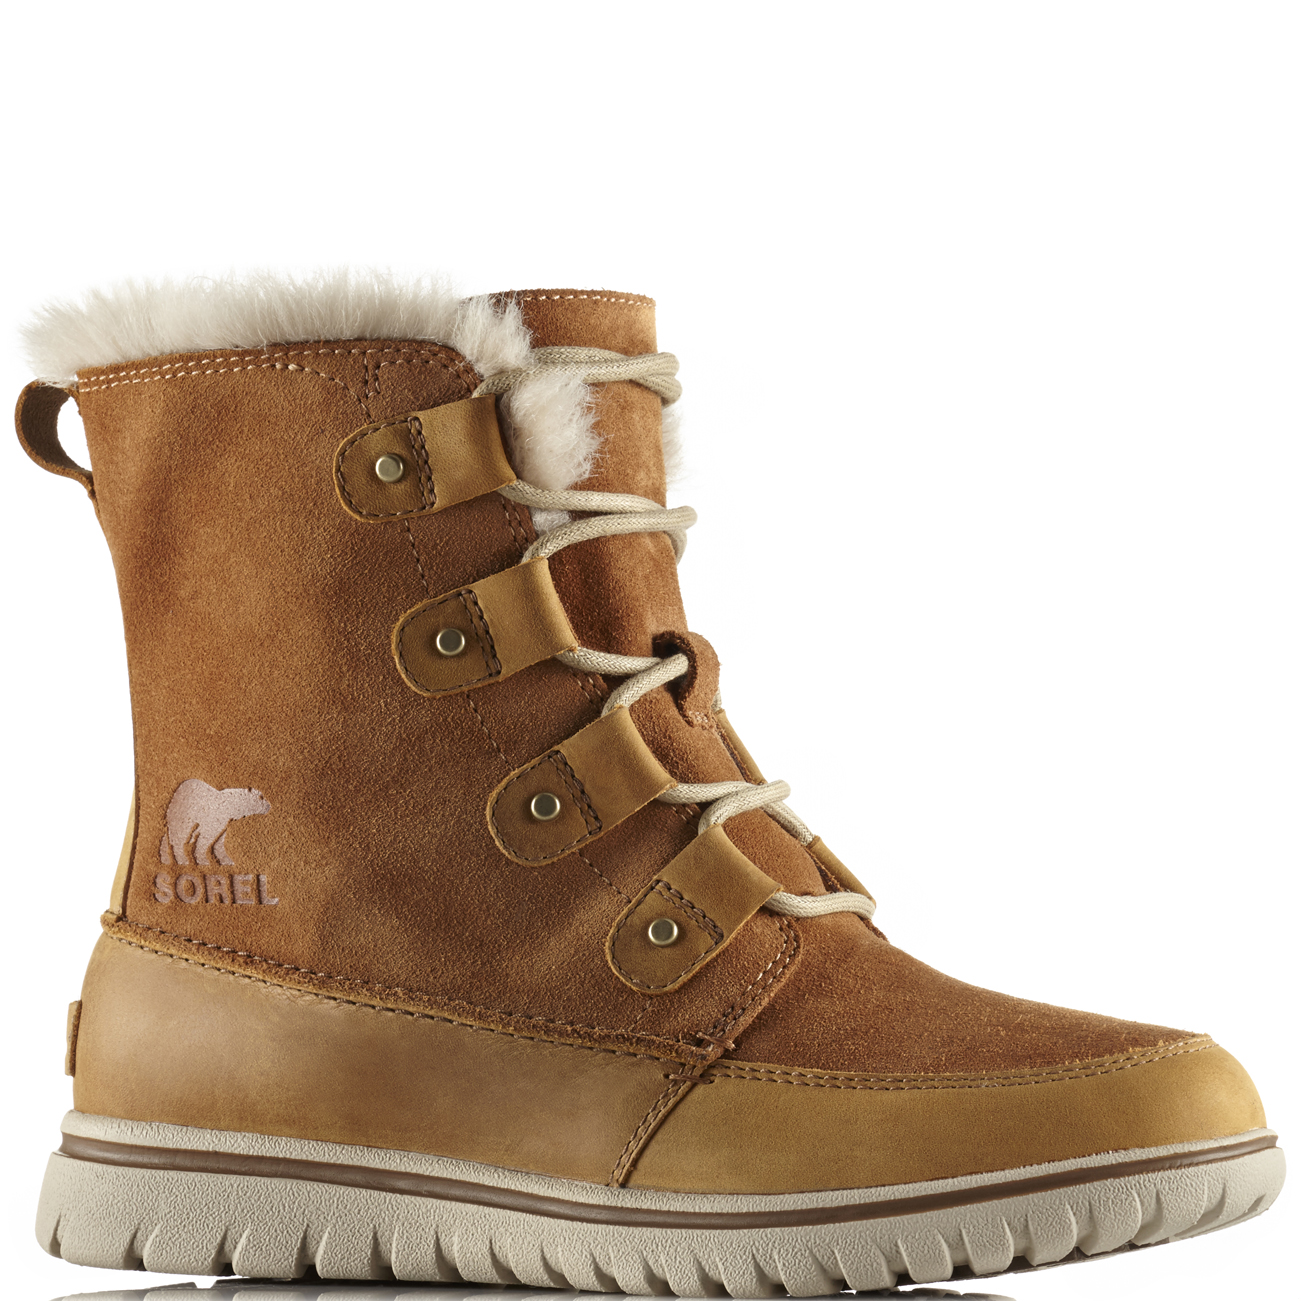 Sorel Shoes Uk